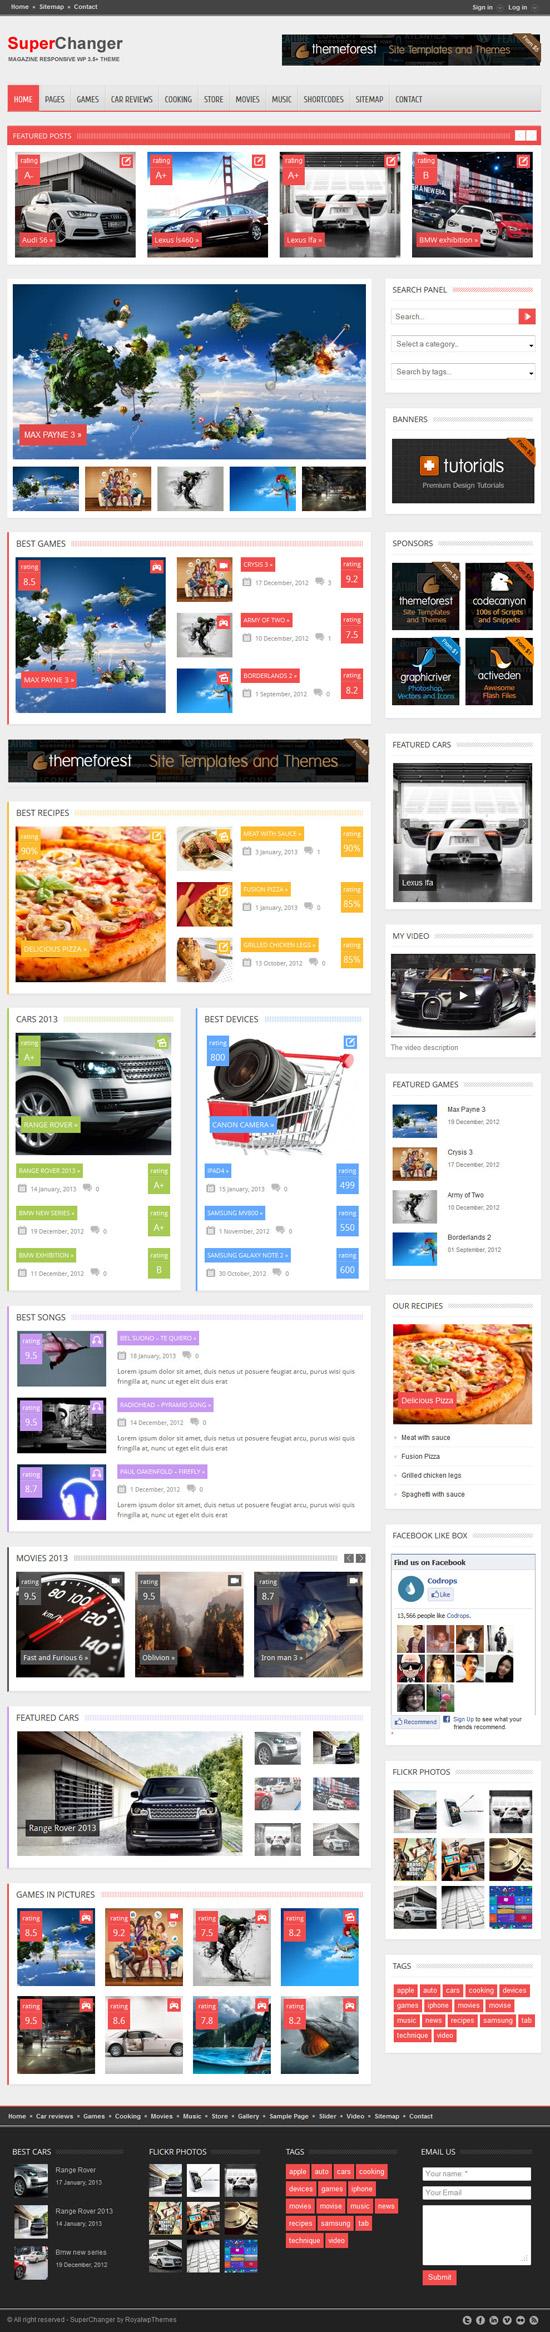 SuperChanger - Responsive WordPress Theme